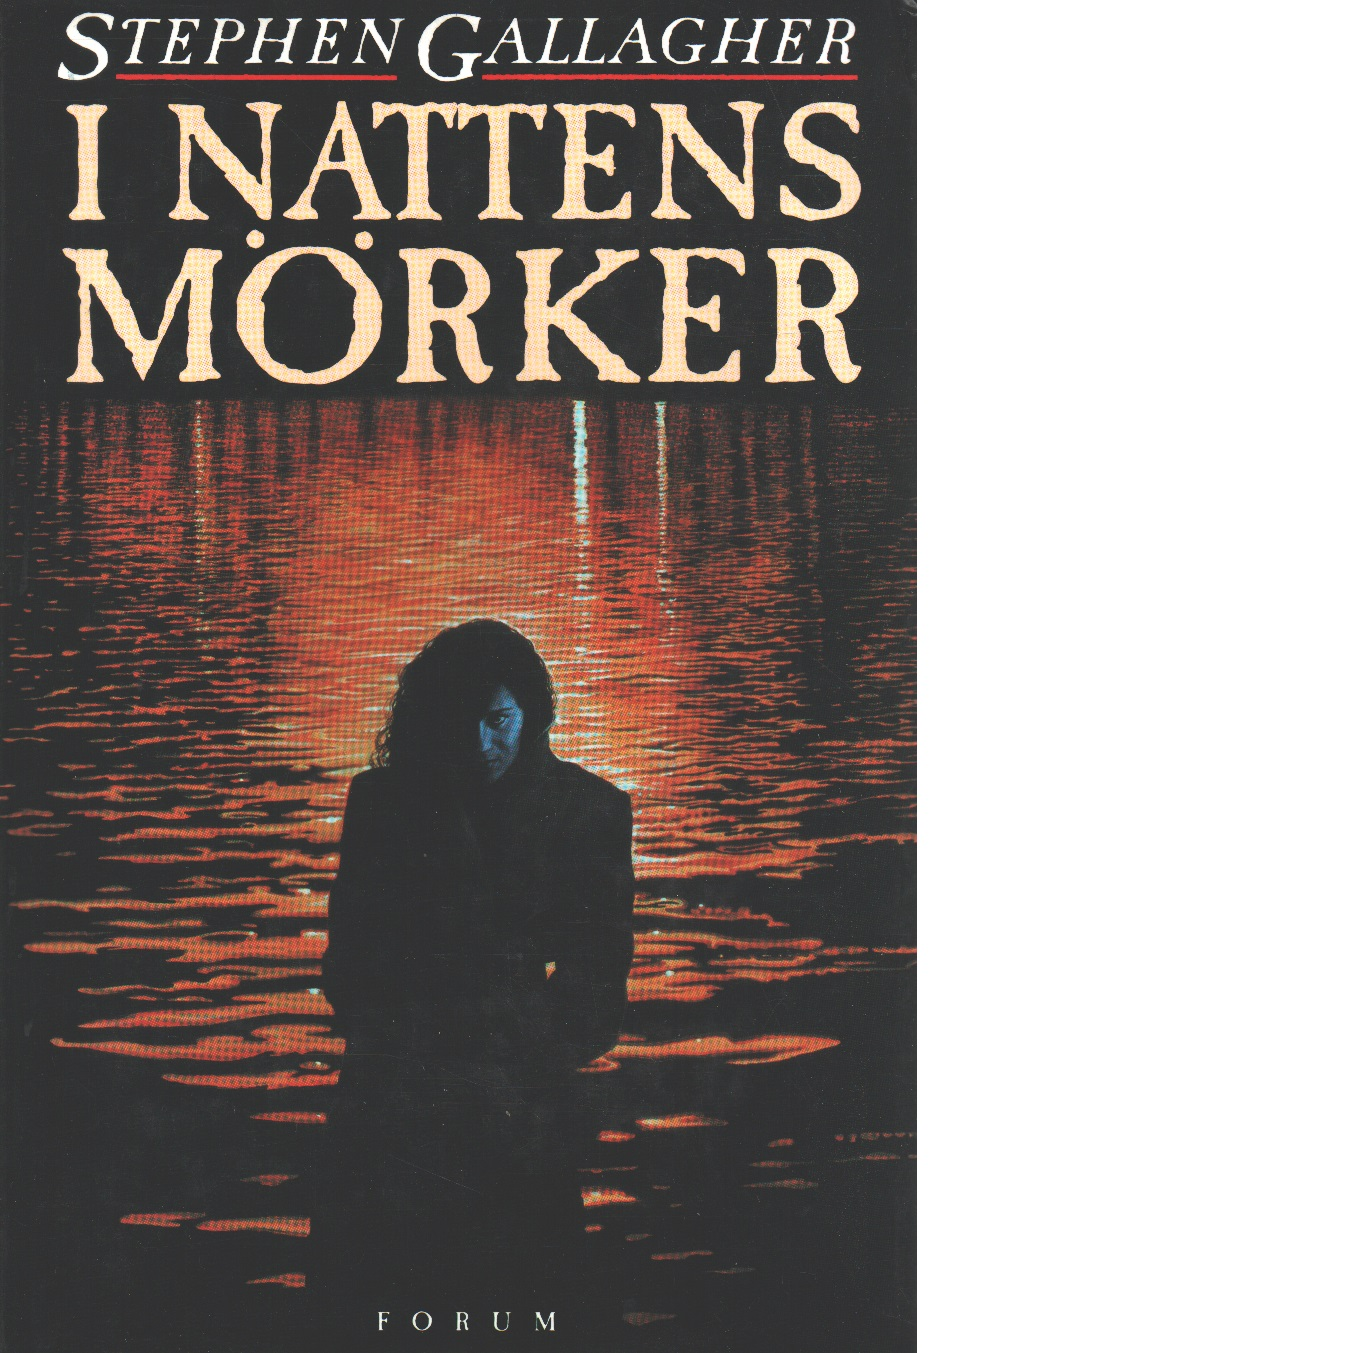 I nattens mörker - Gallagher, Stephen